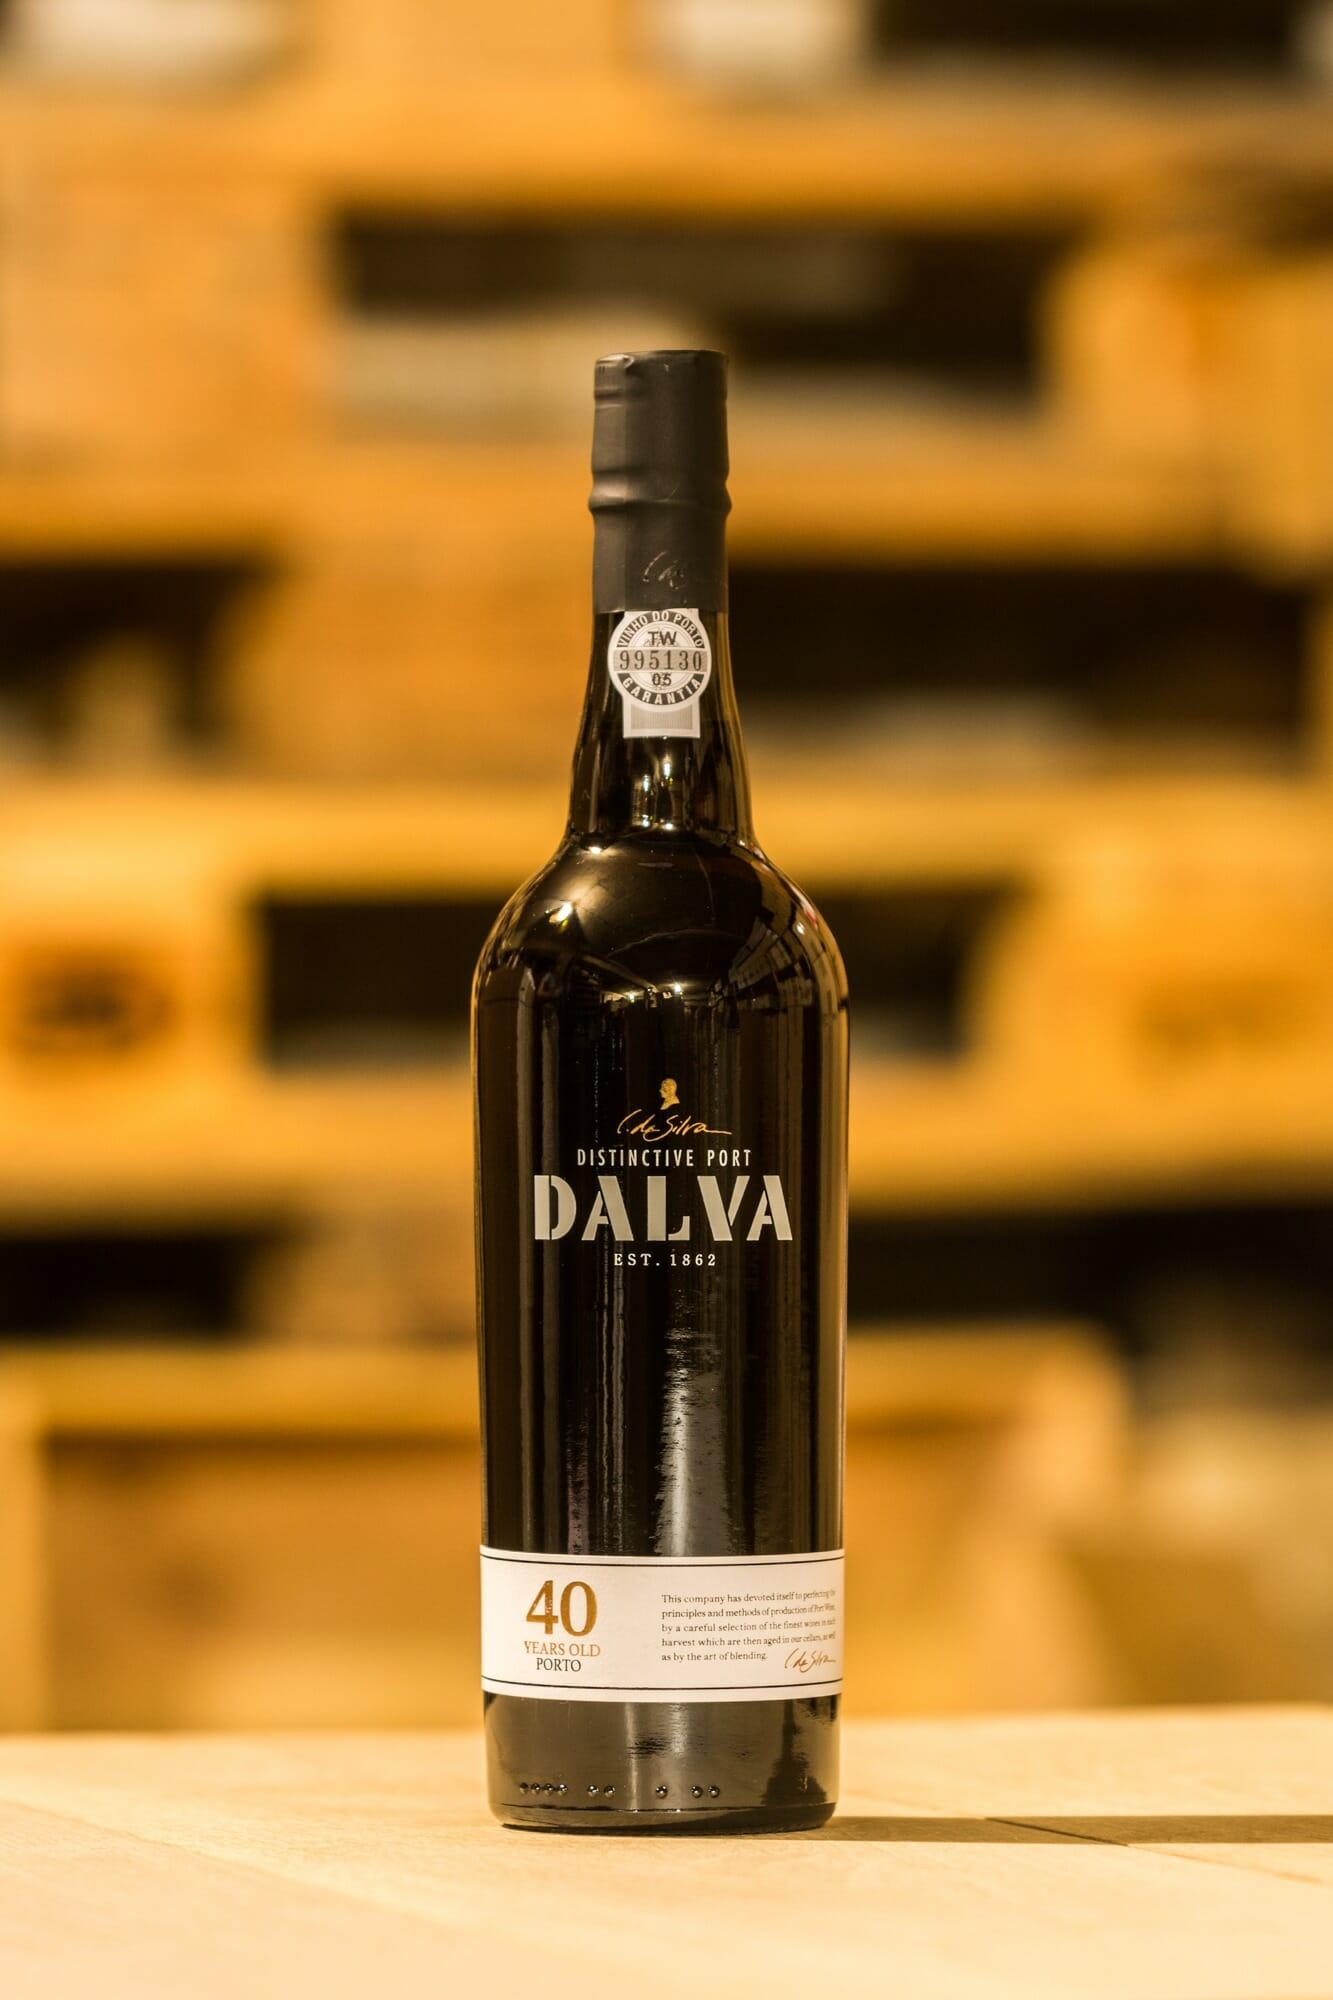 C. da Silva Dalva 40 Years Old Tawny Port